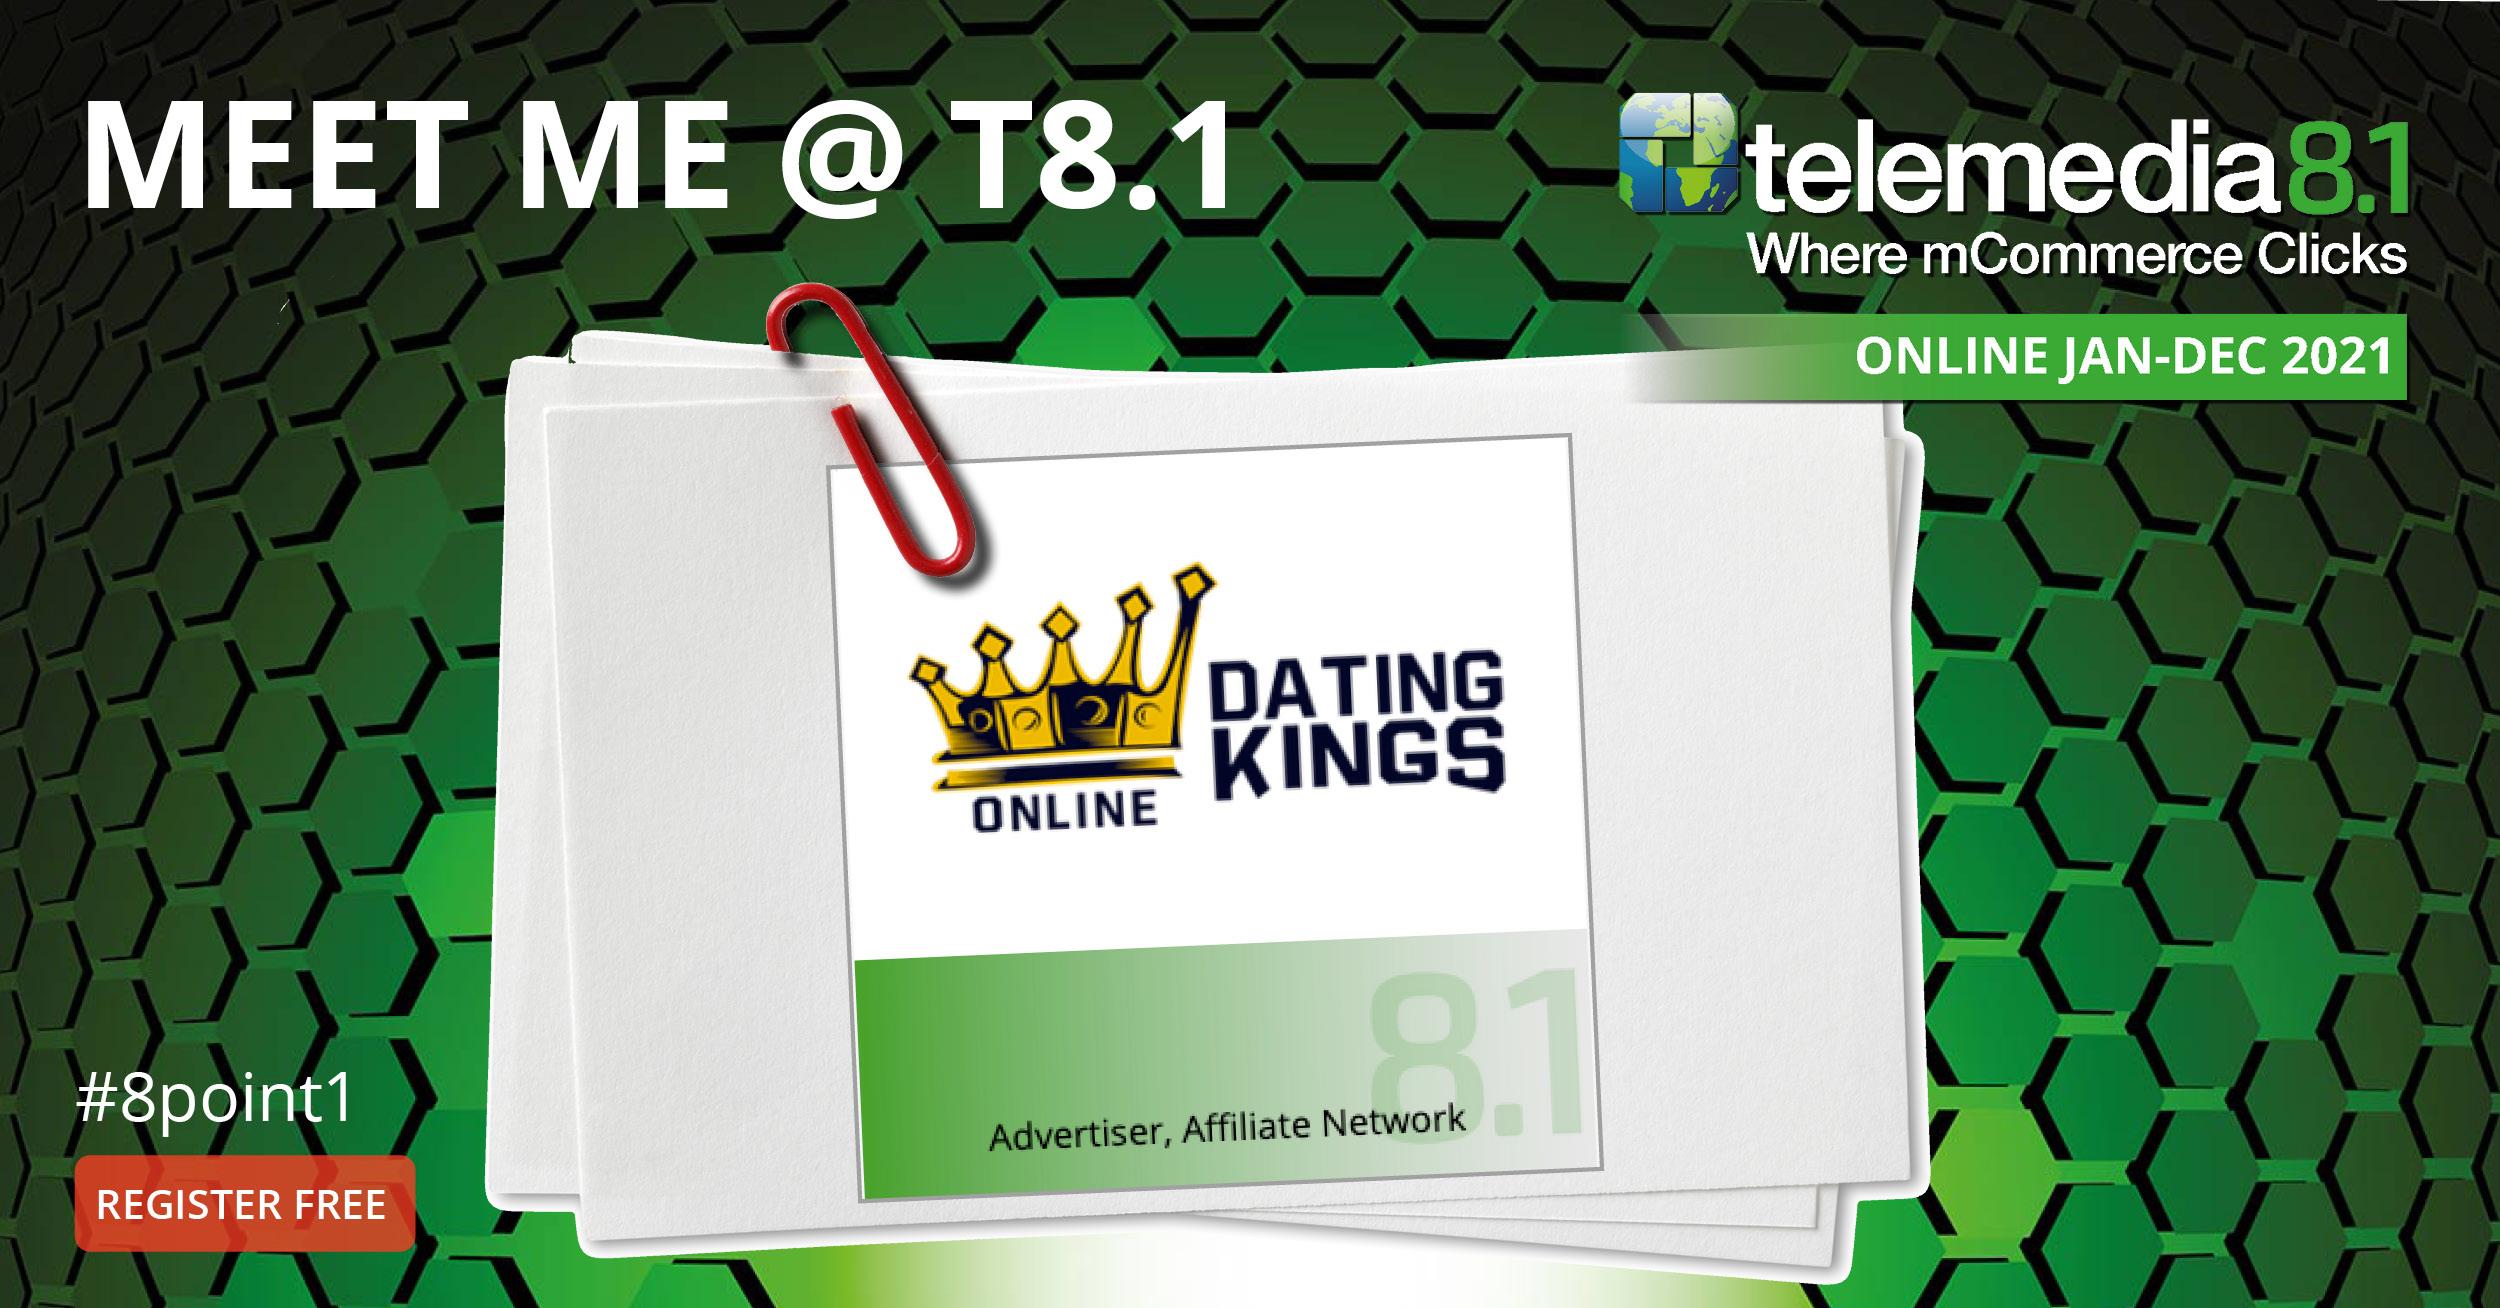 online-dating-kings